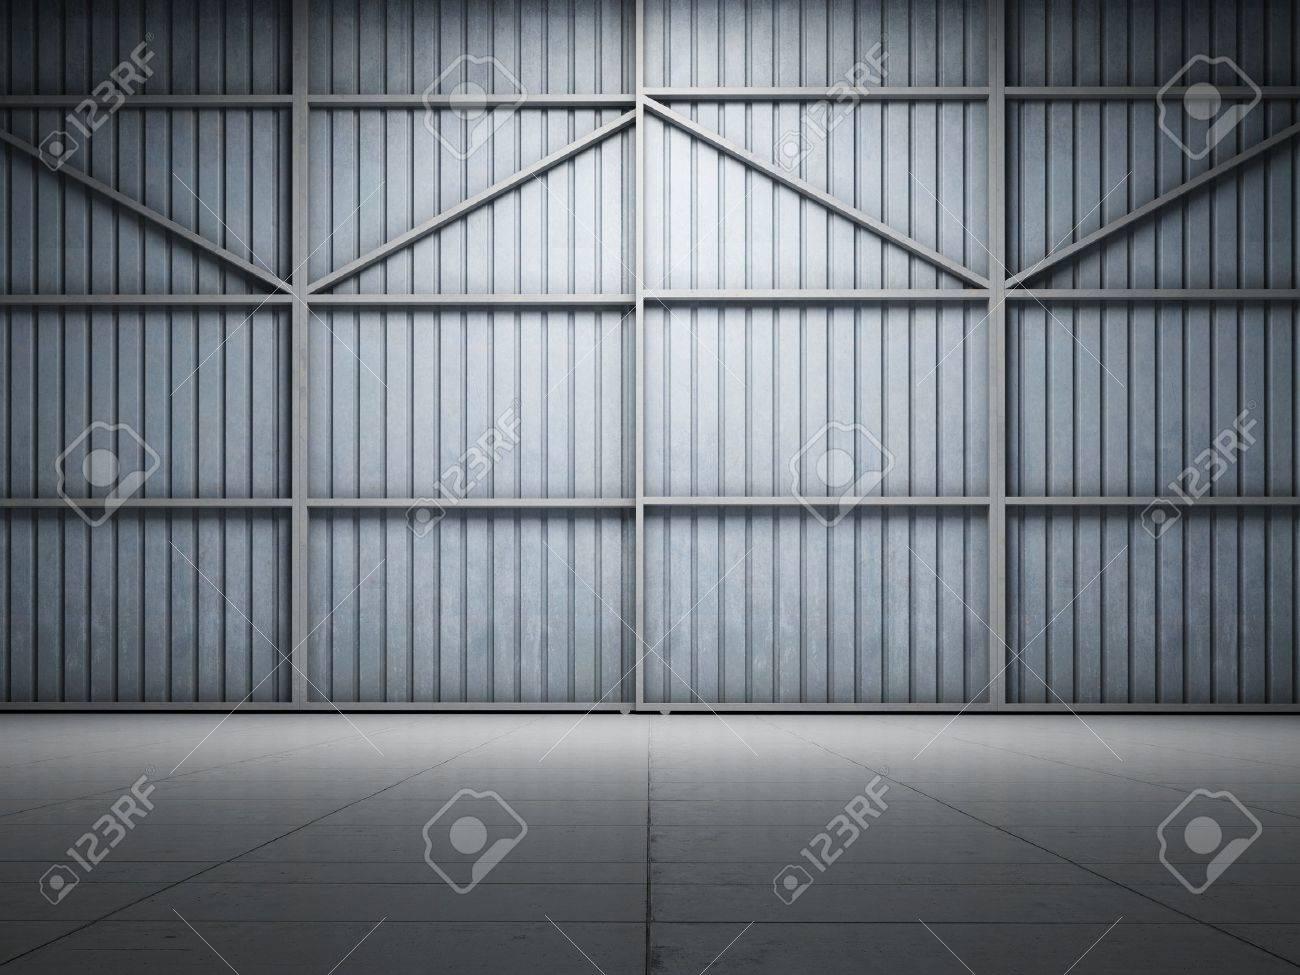 Large warehouse door illuminate spotlight Stock Photo - 11308819 & Large Warehouse Door Illuminate Spotlight Stock Photo Picture And ...